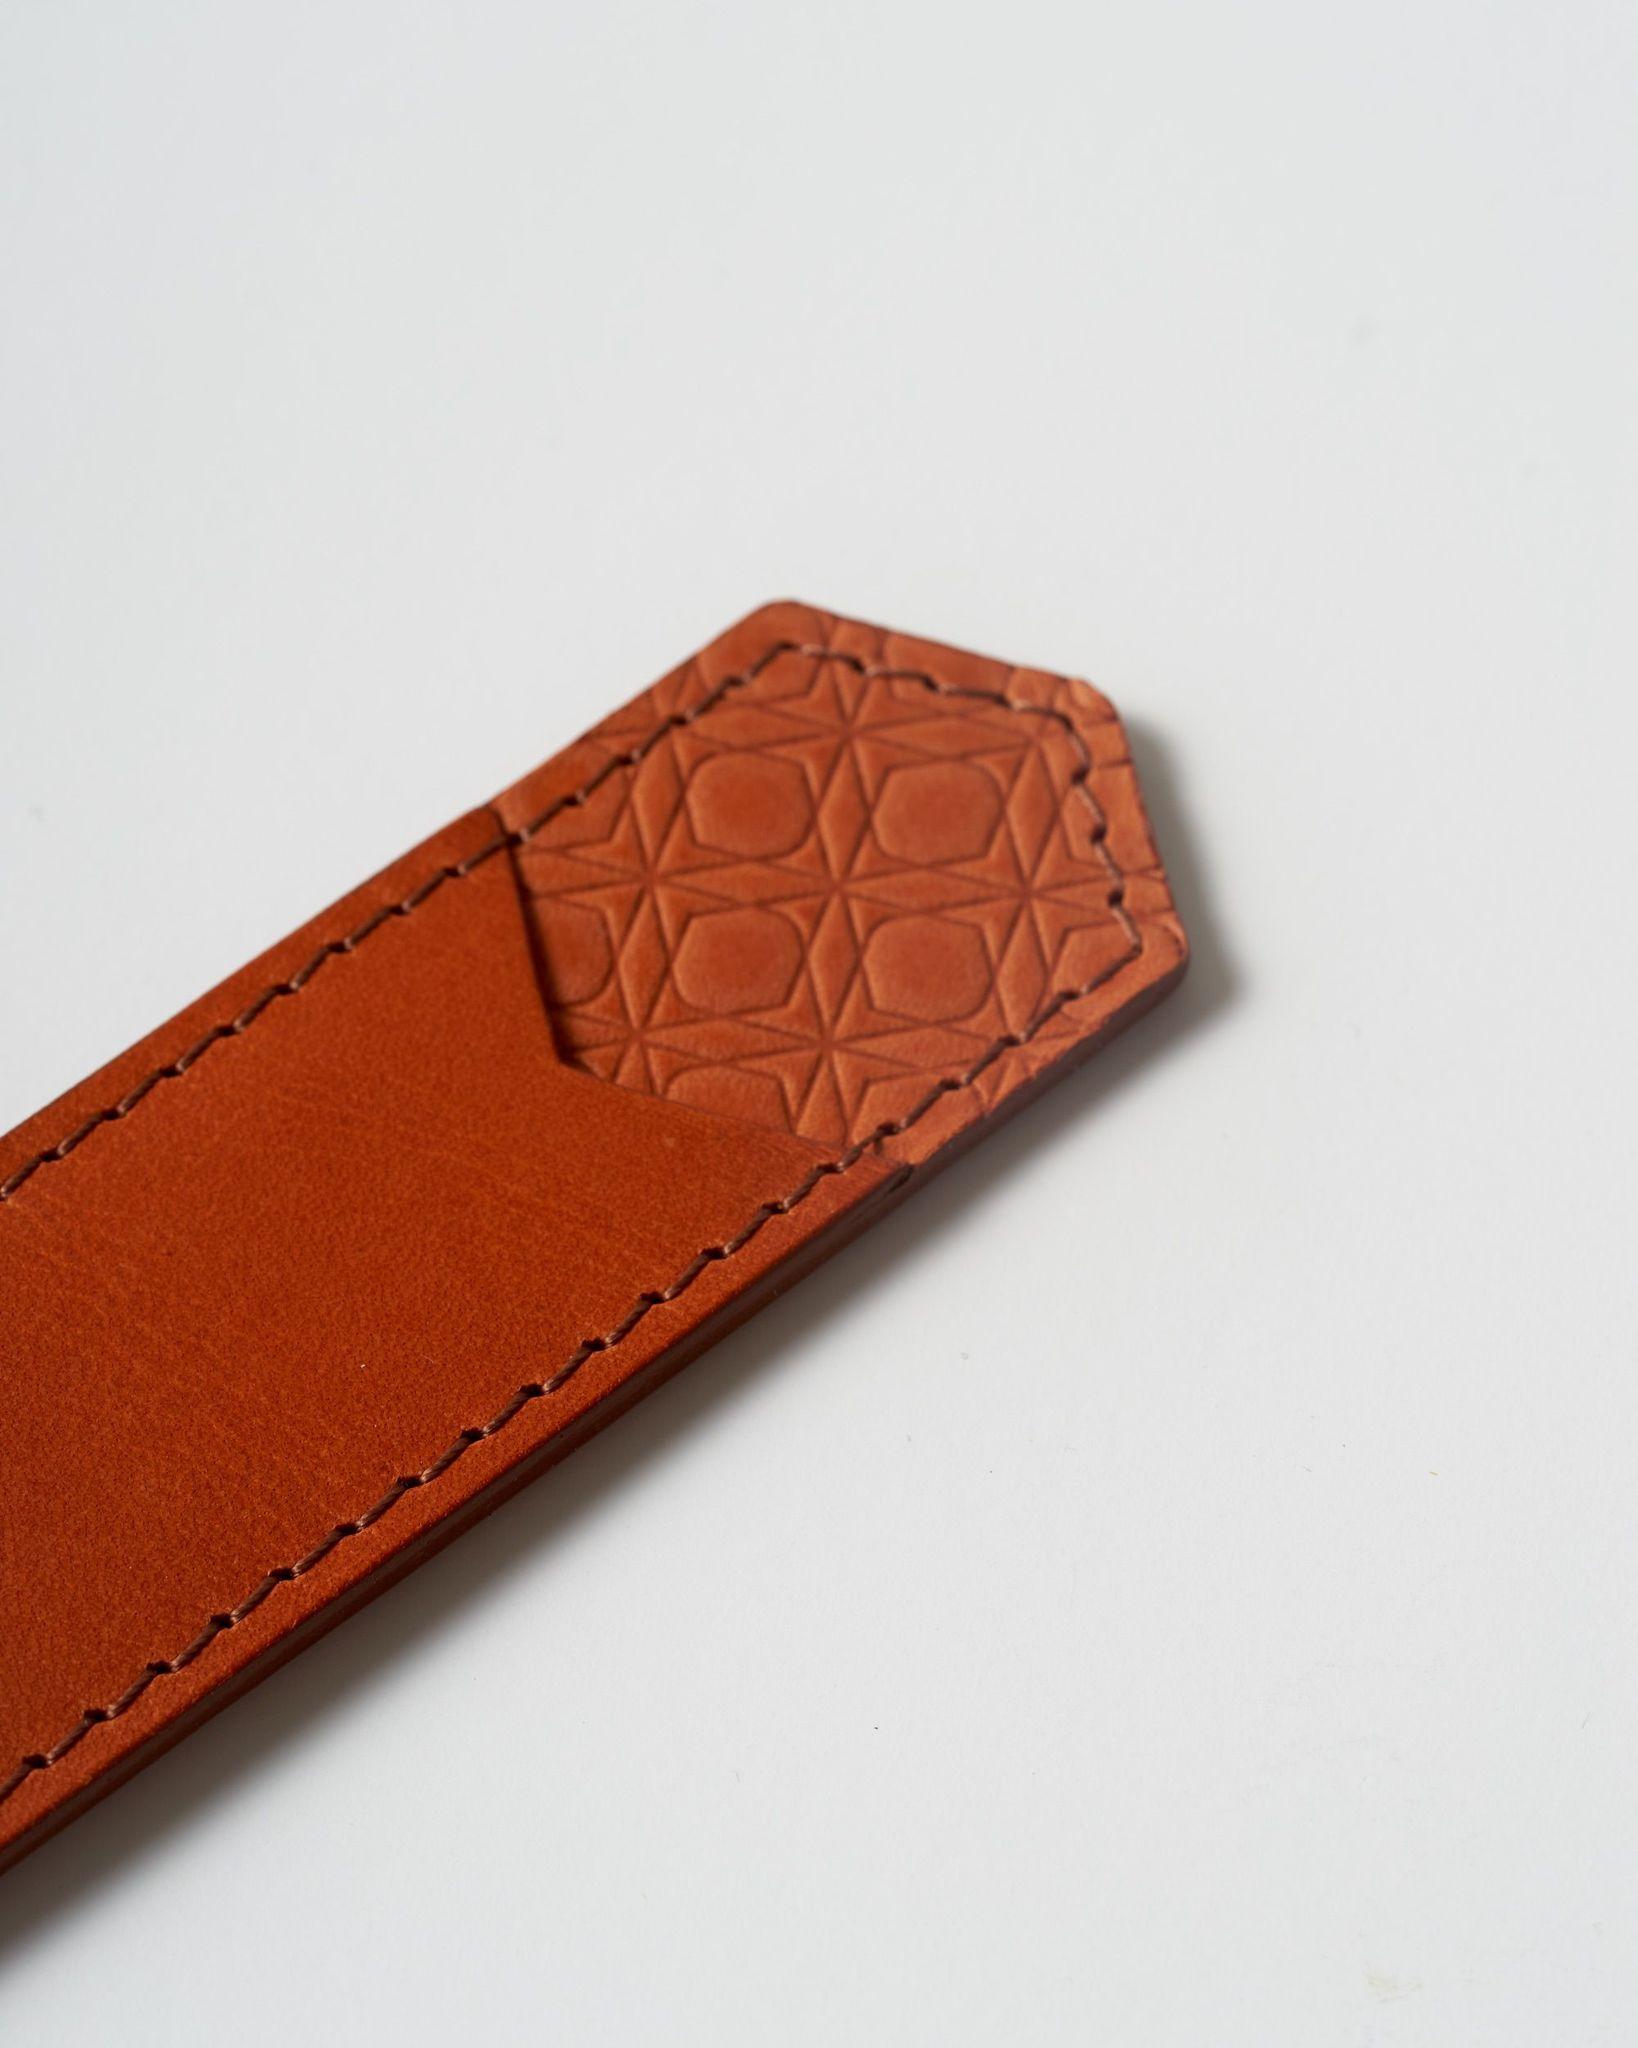 Ajoto Pen Pouch Caramel - чехол кожаный